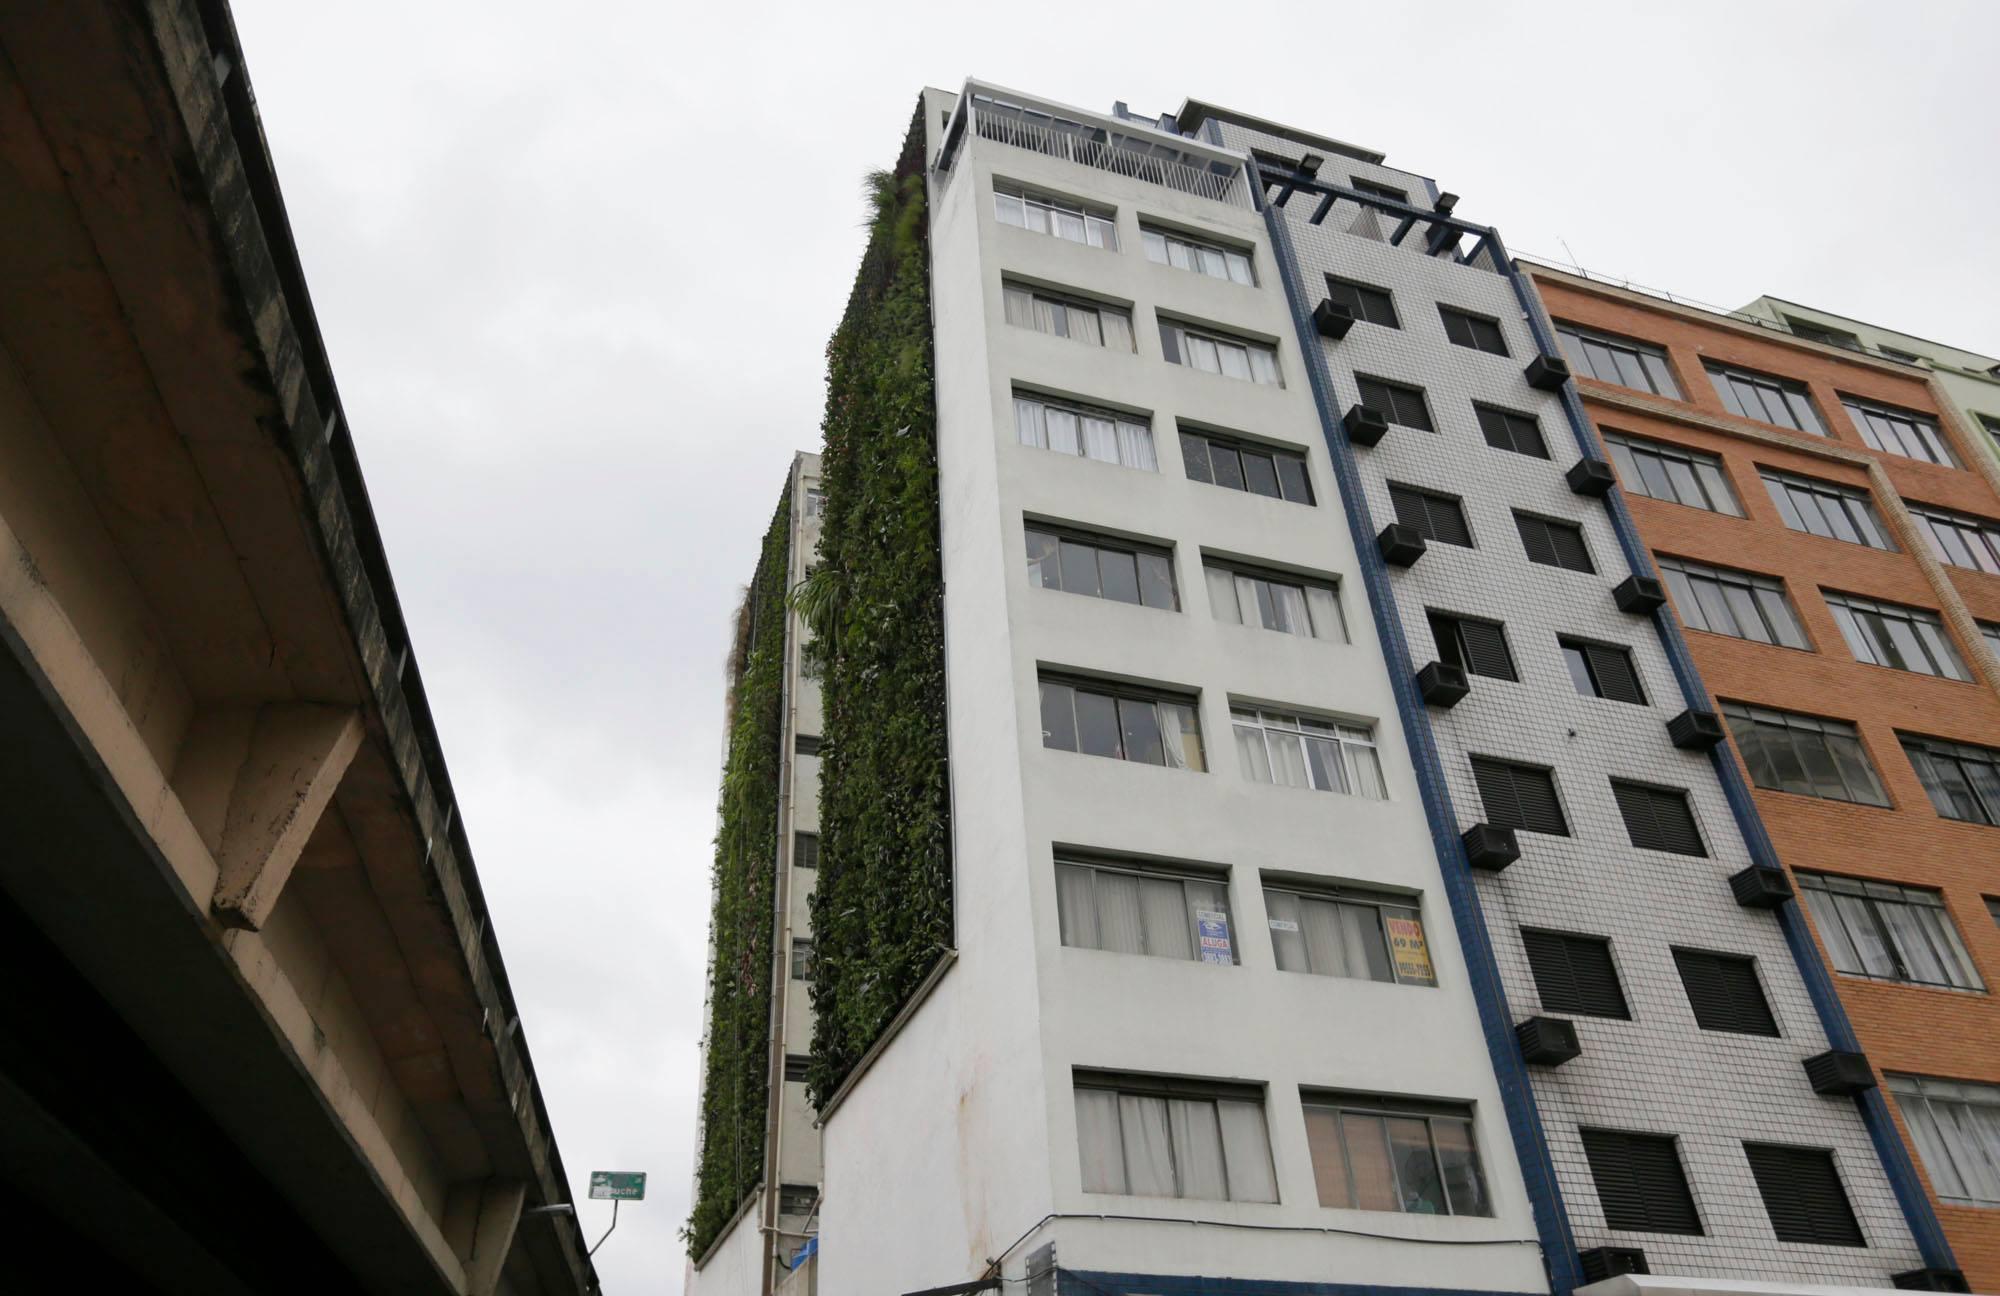 Minhocão ganhará 40 jardins verticais